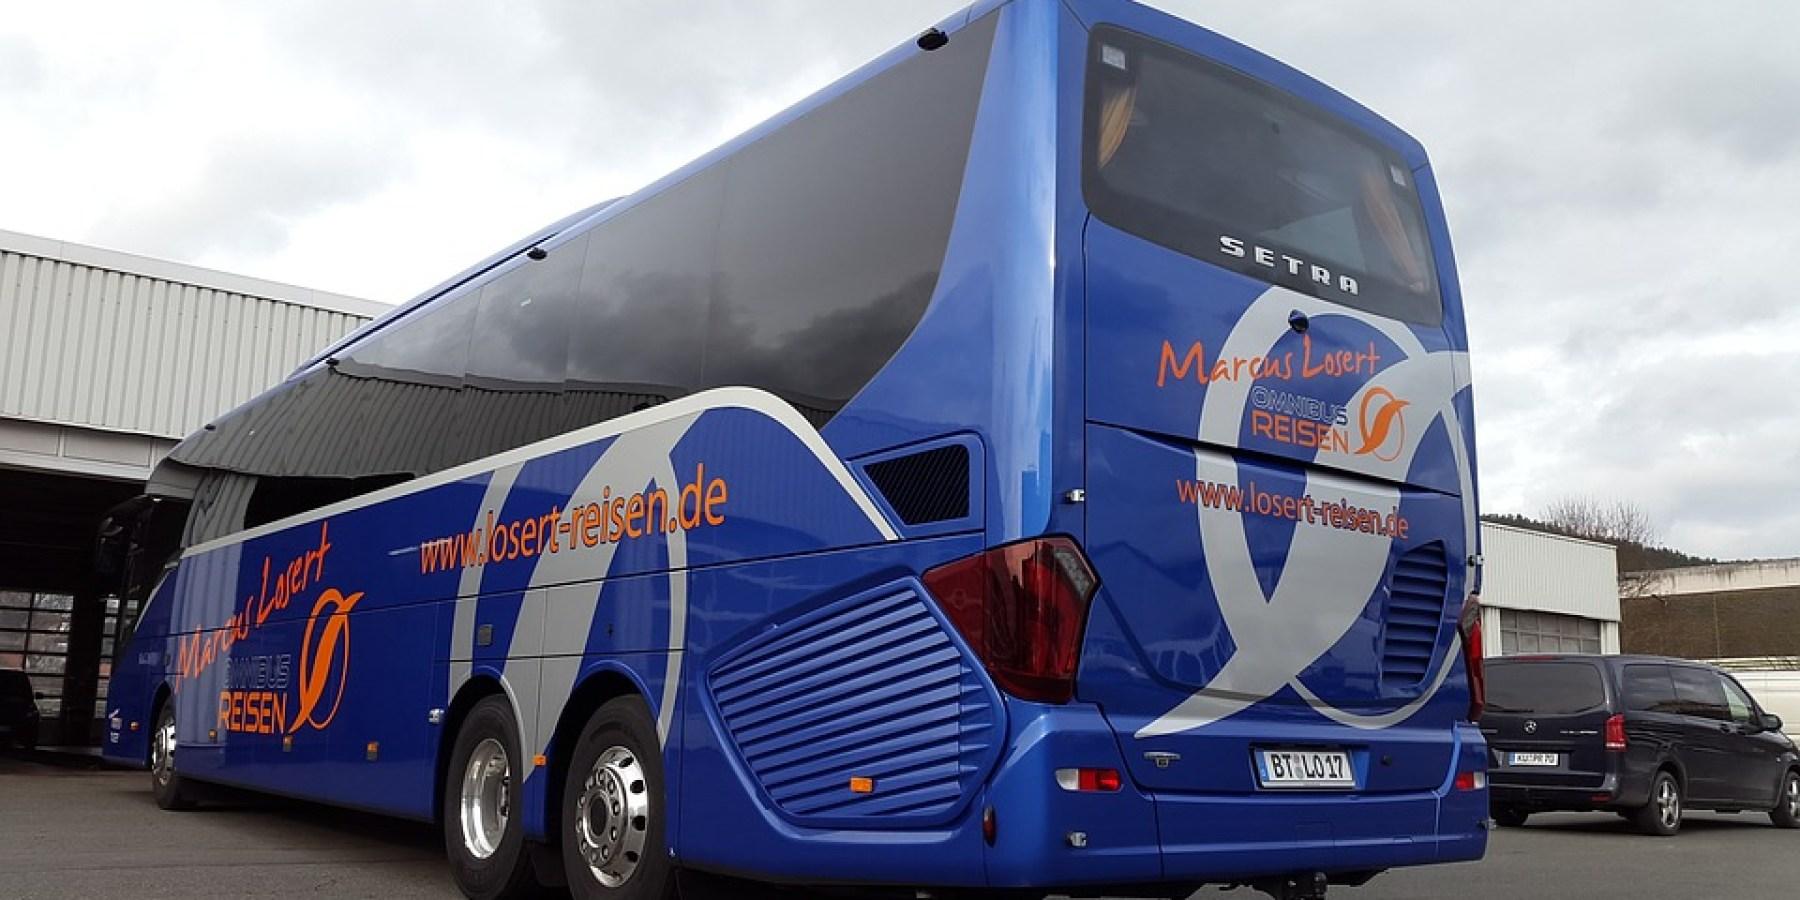 Verlorenes Rad eines Reisebusses rollt auf Bahngleise